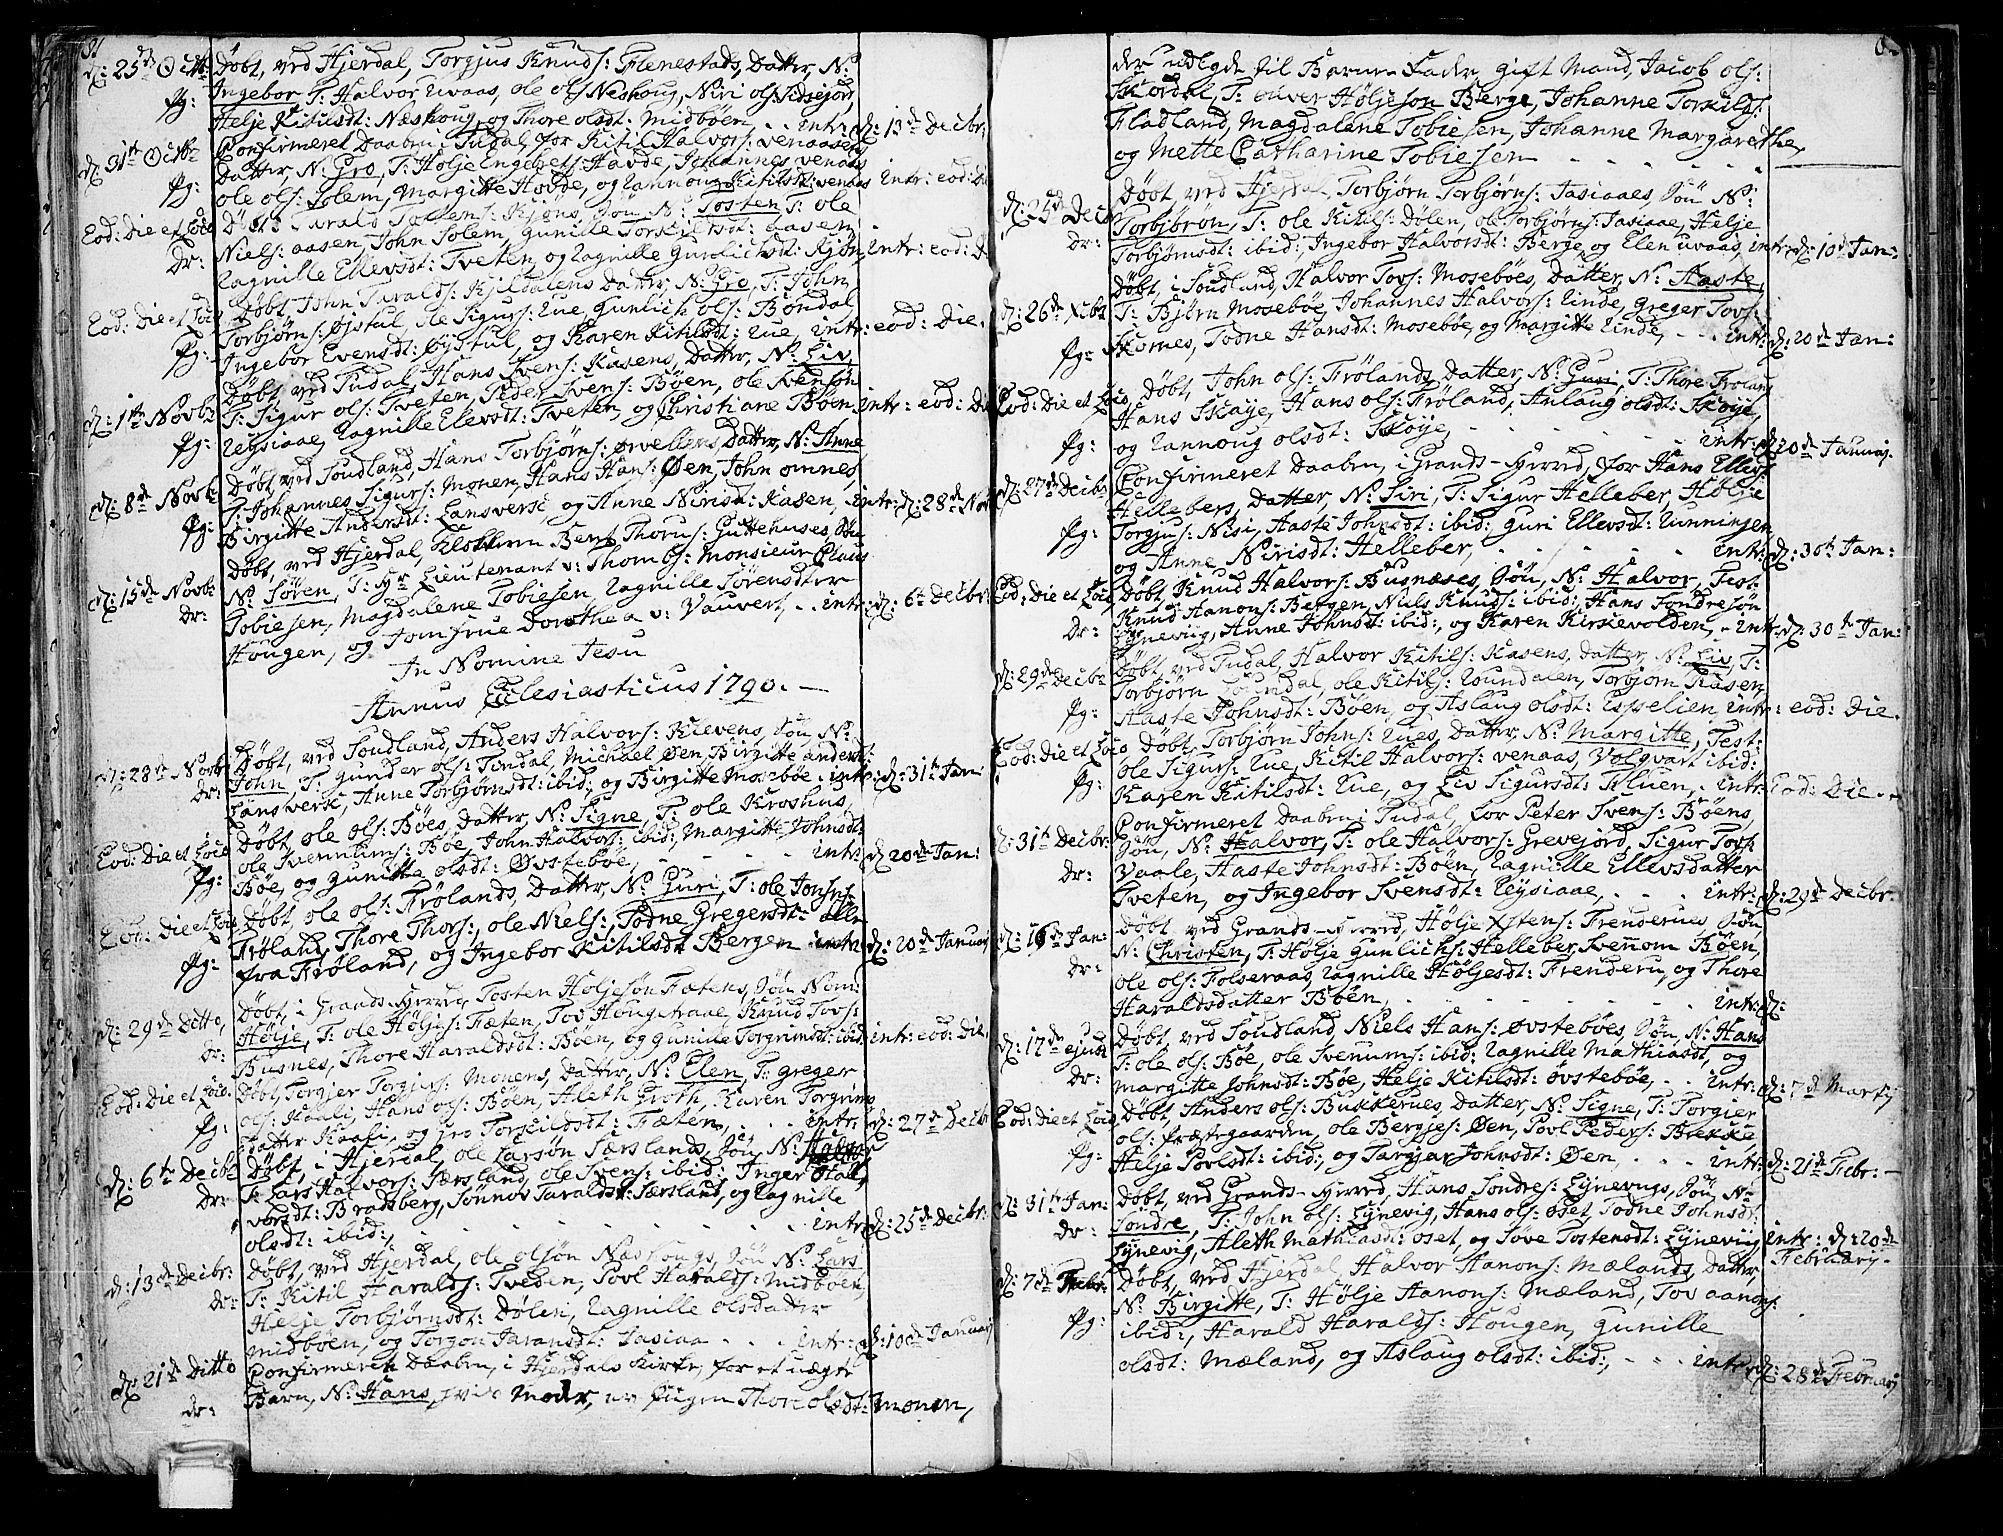 SAKO, Hjartdal kirkebøker, F/Fa/L0005: Ministerialbok nr. I 5, 1776-1801, s. 81-82